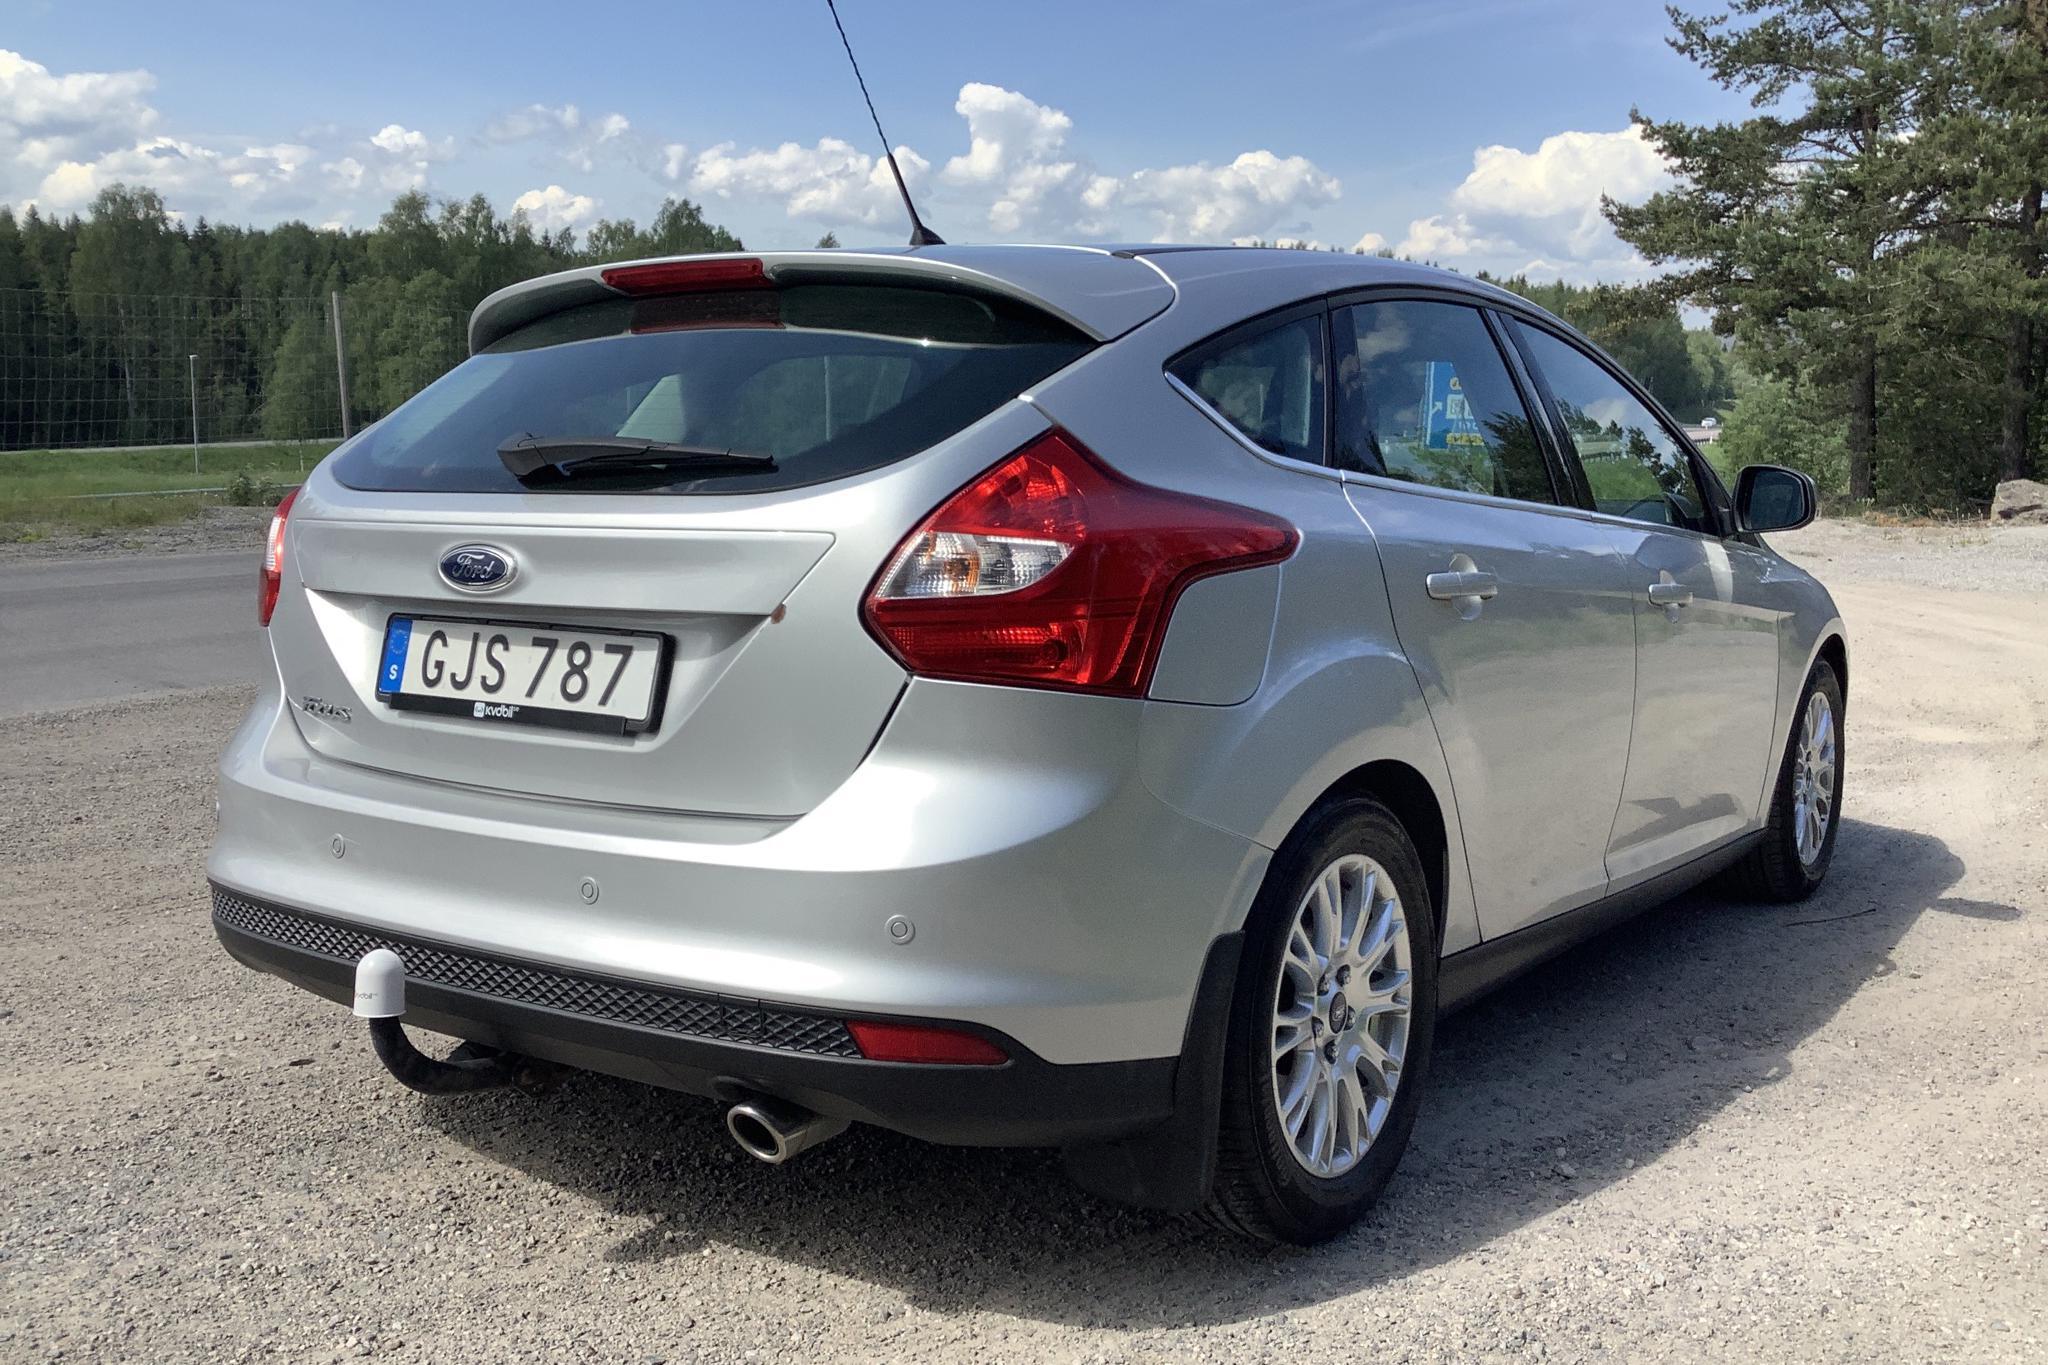 Ford Focus 1.6 Flexifuel 5dr (150hk) - 5 229 mil - Manuell - grå - 2015